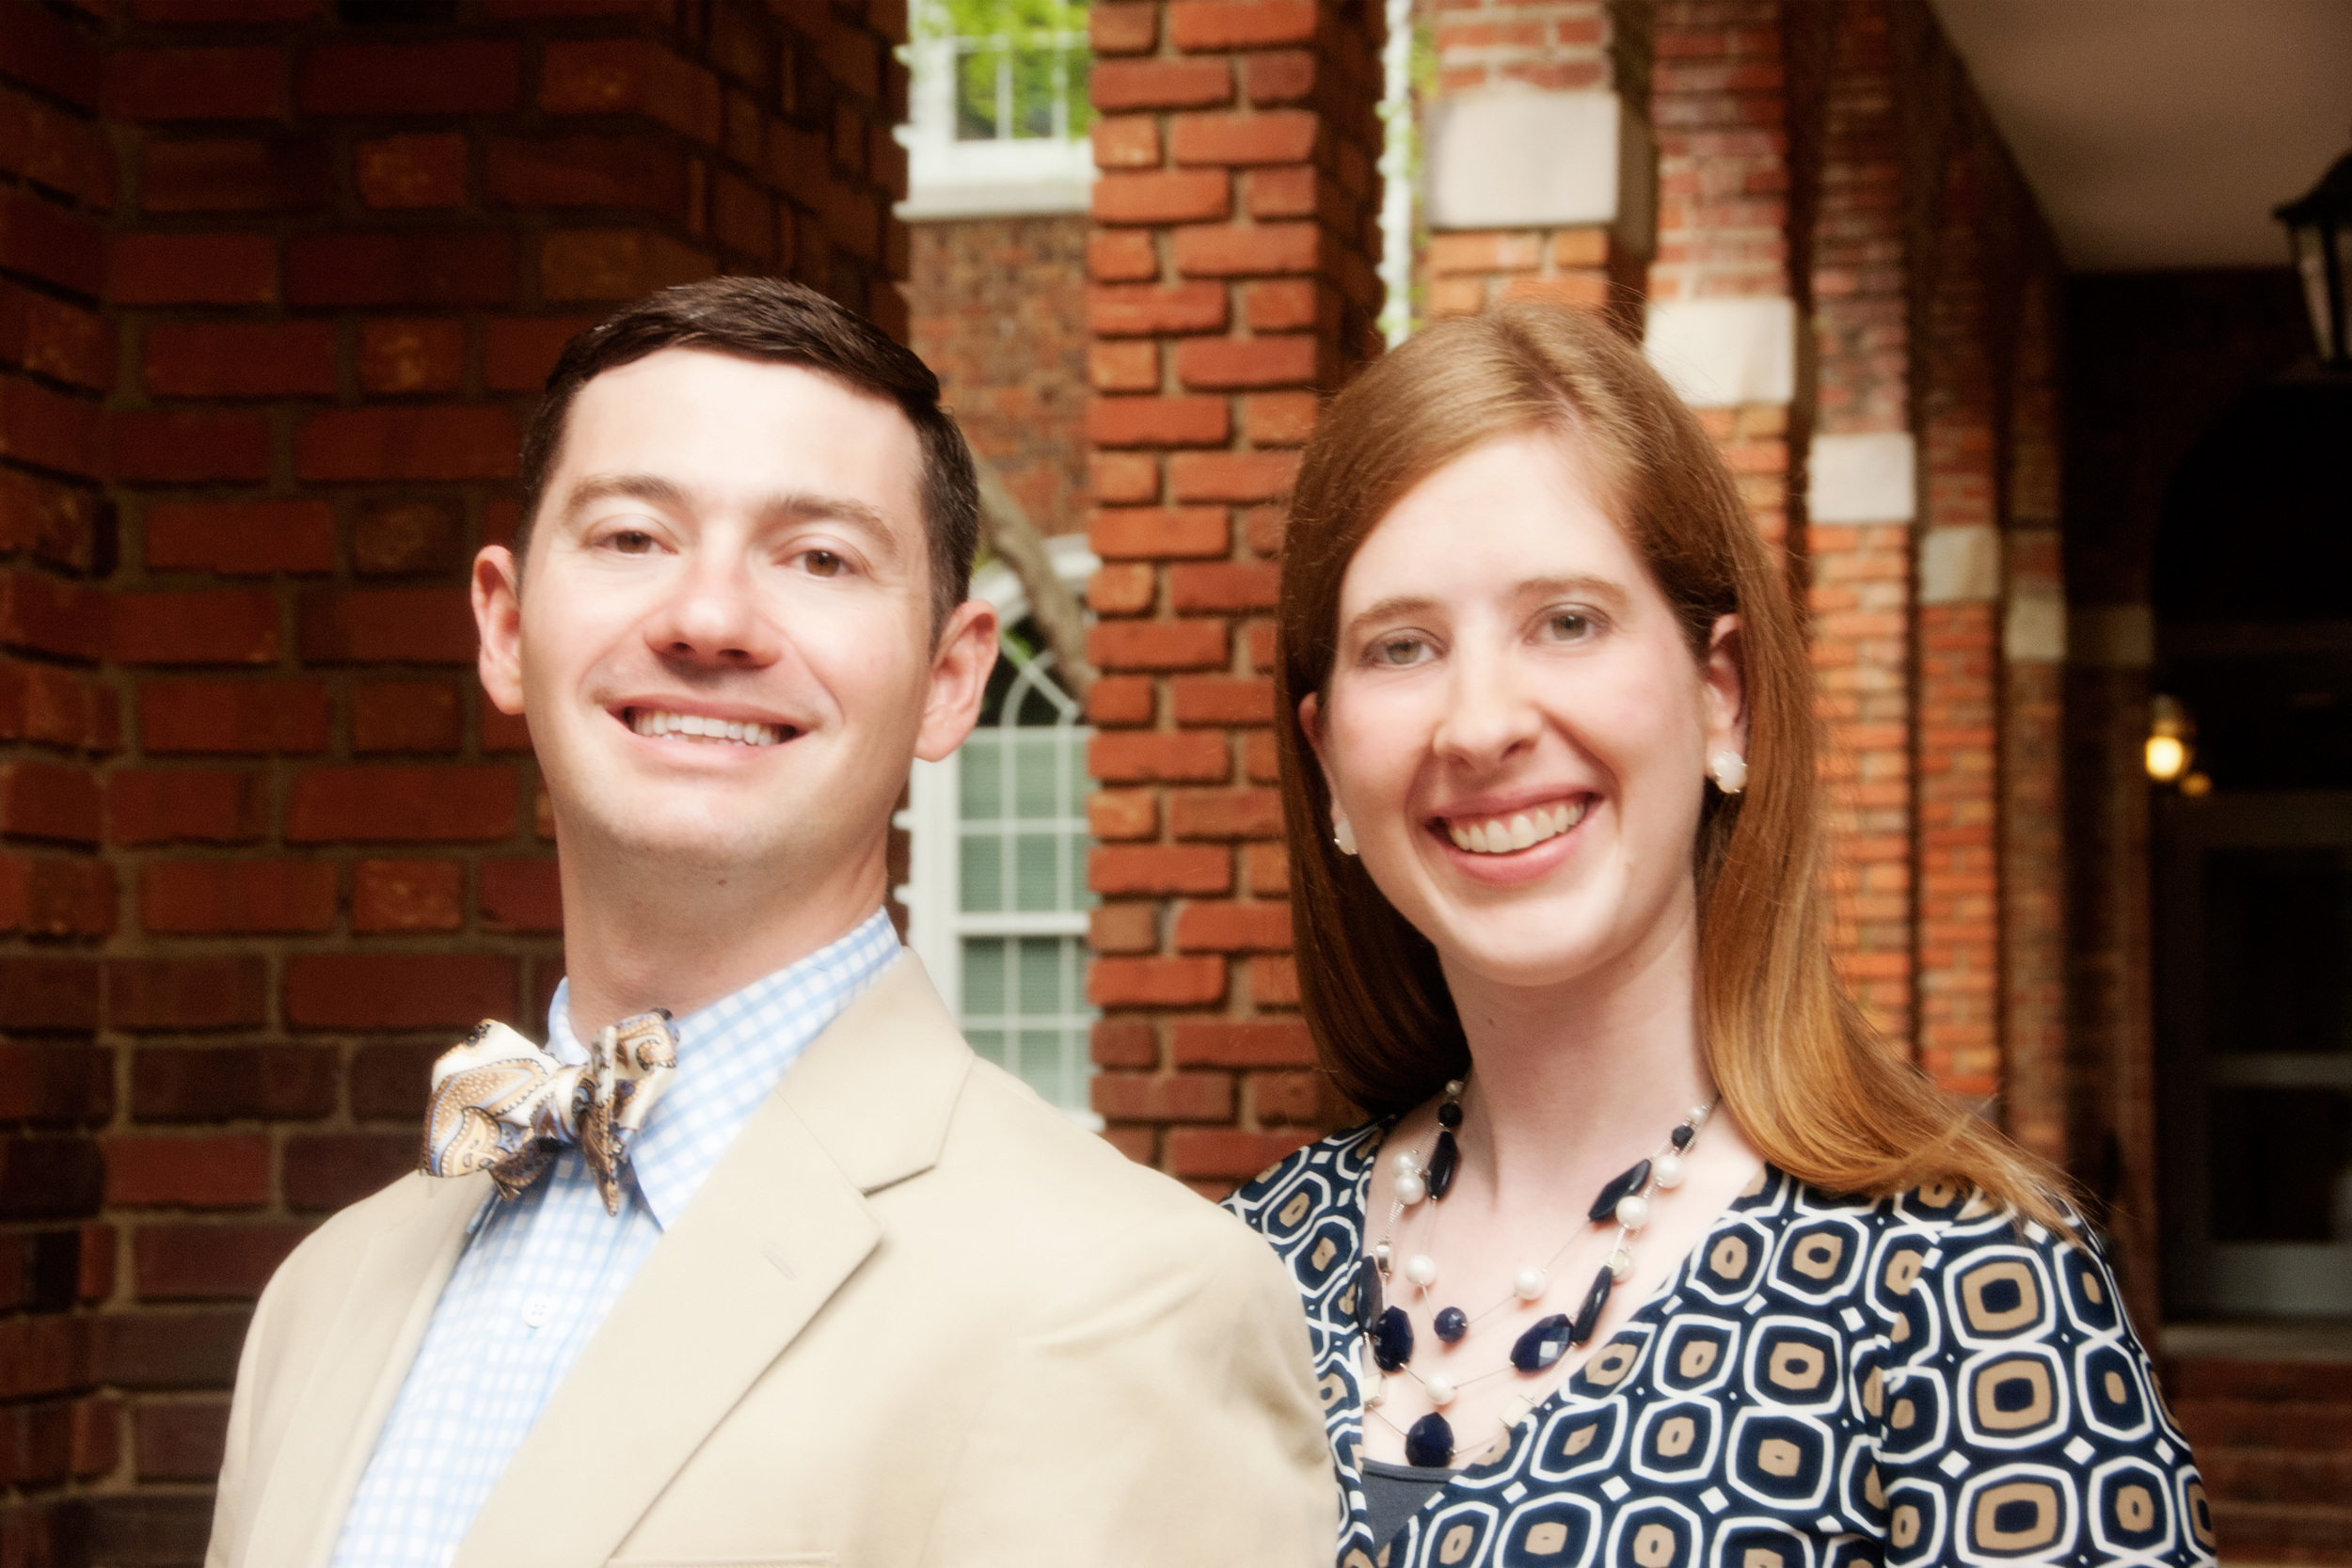 Duo Eichene: DeMar Neal, baritone, and Katherine Thomas, piano